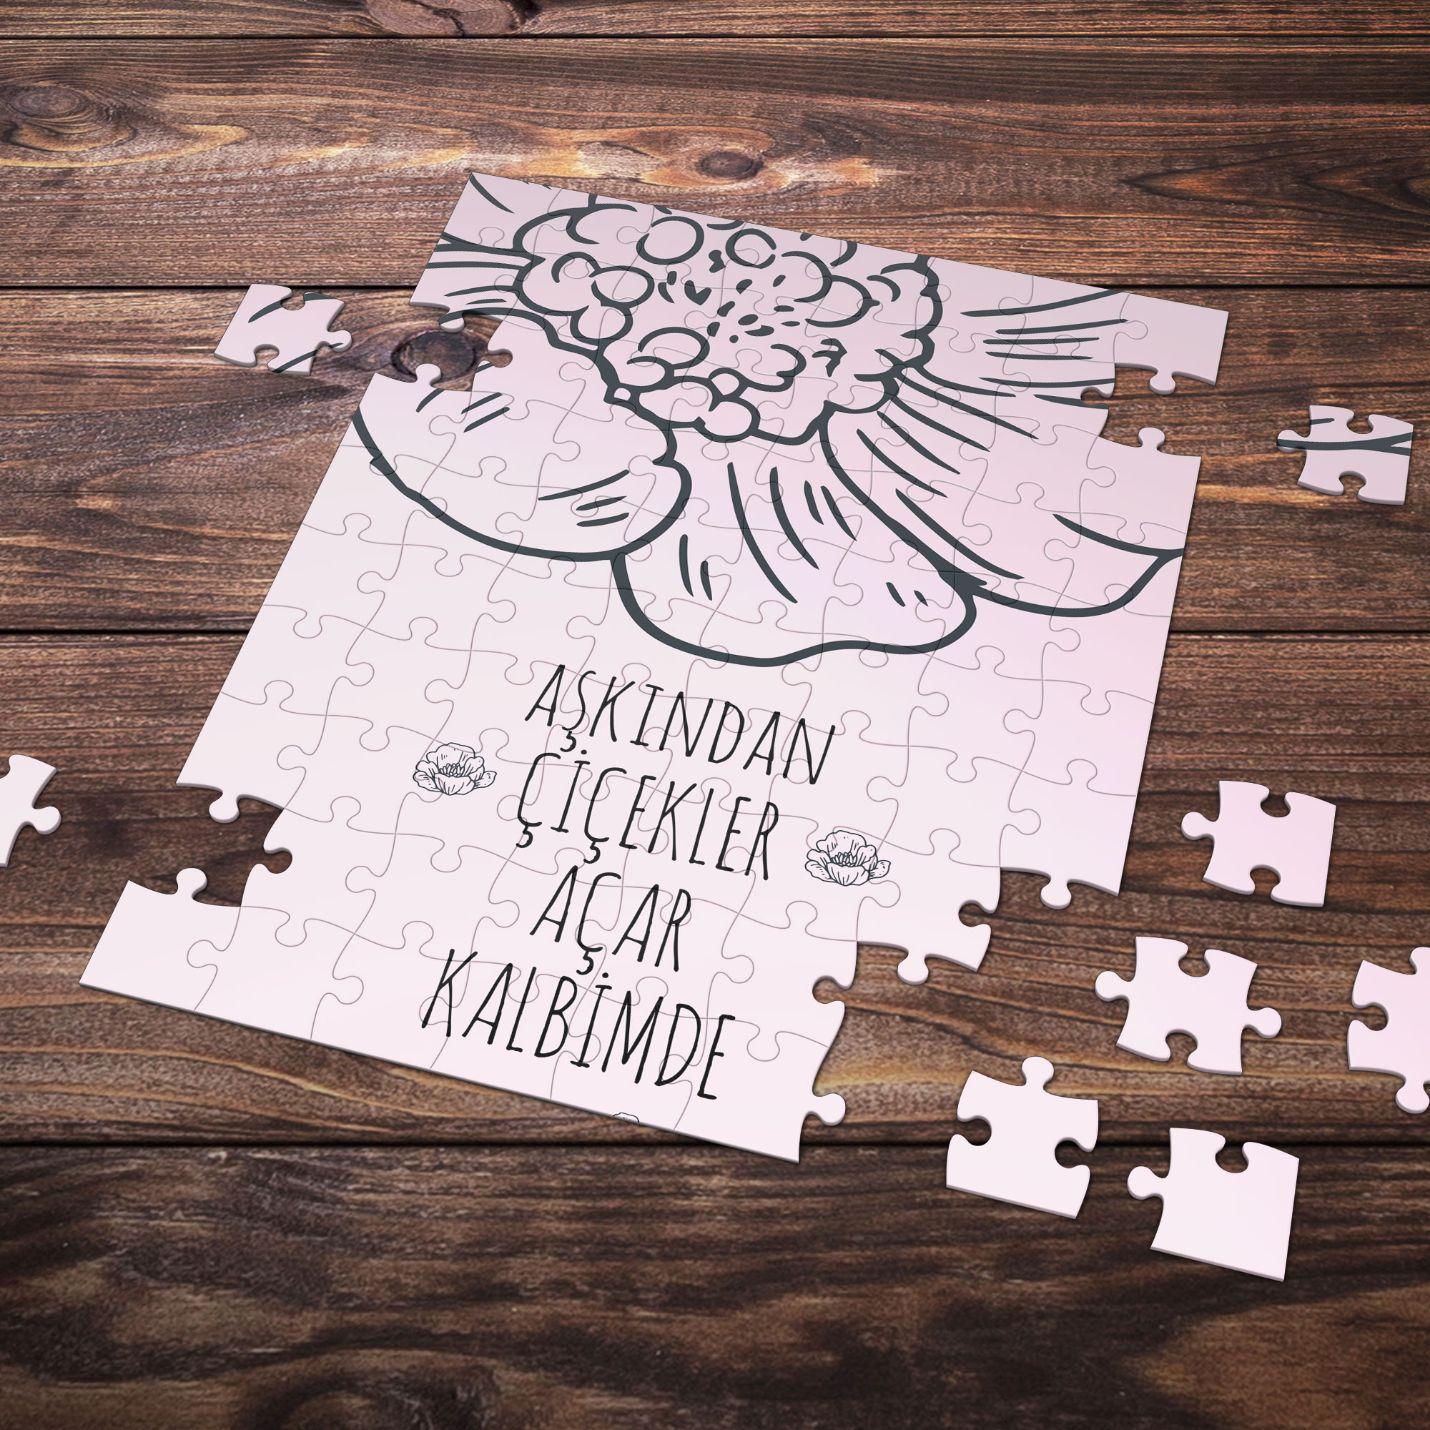 99 Parça Romantik Tasarımlı Puzzle Yapboz No22